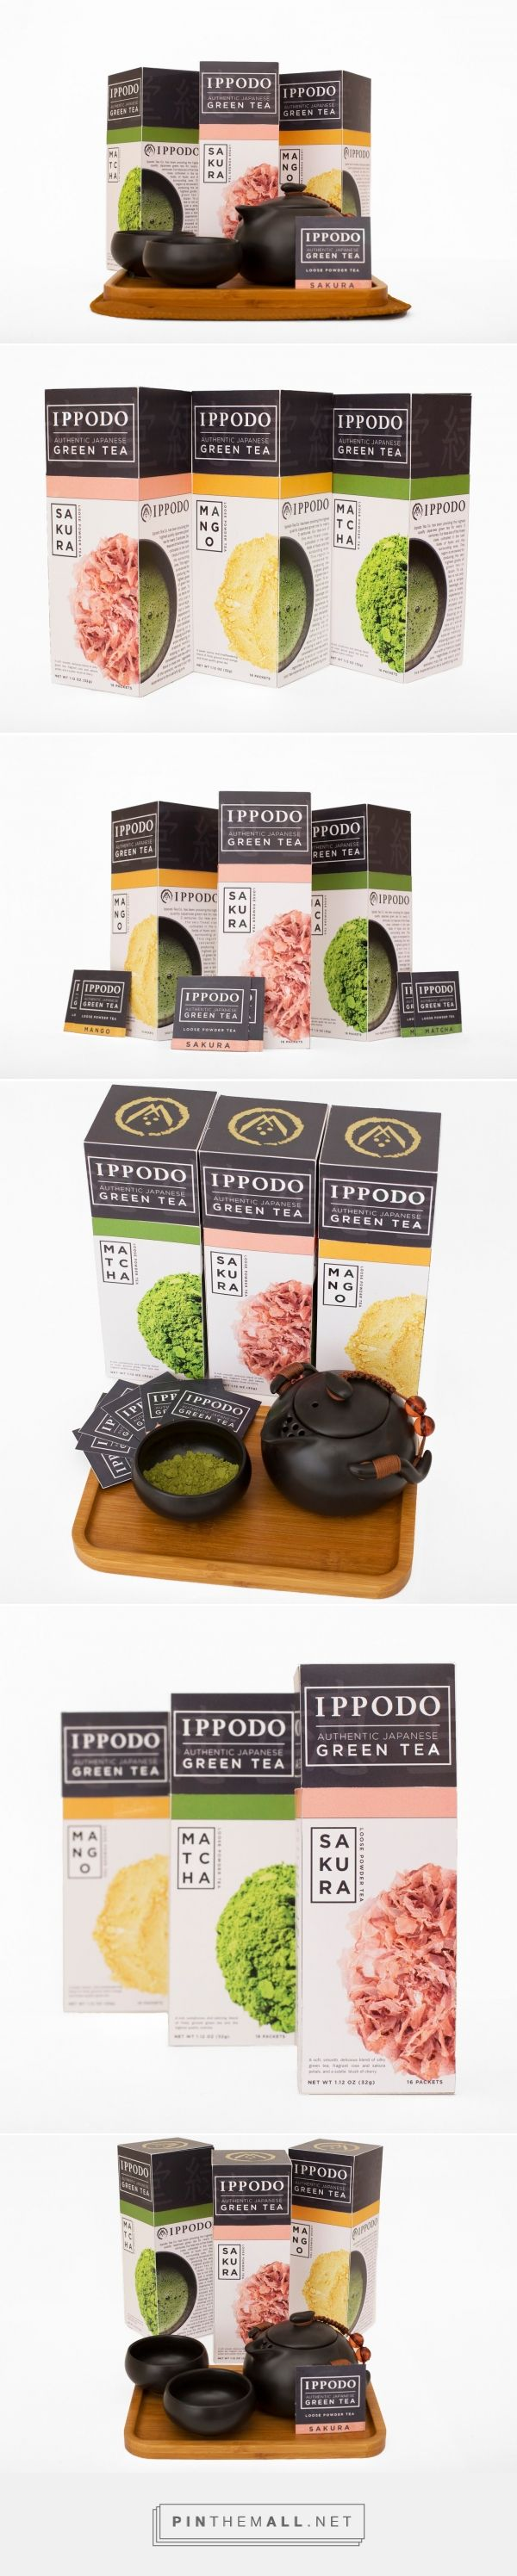 Ippodo Tea Co. (Student Project)